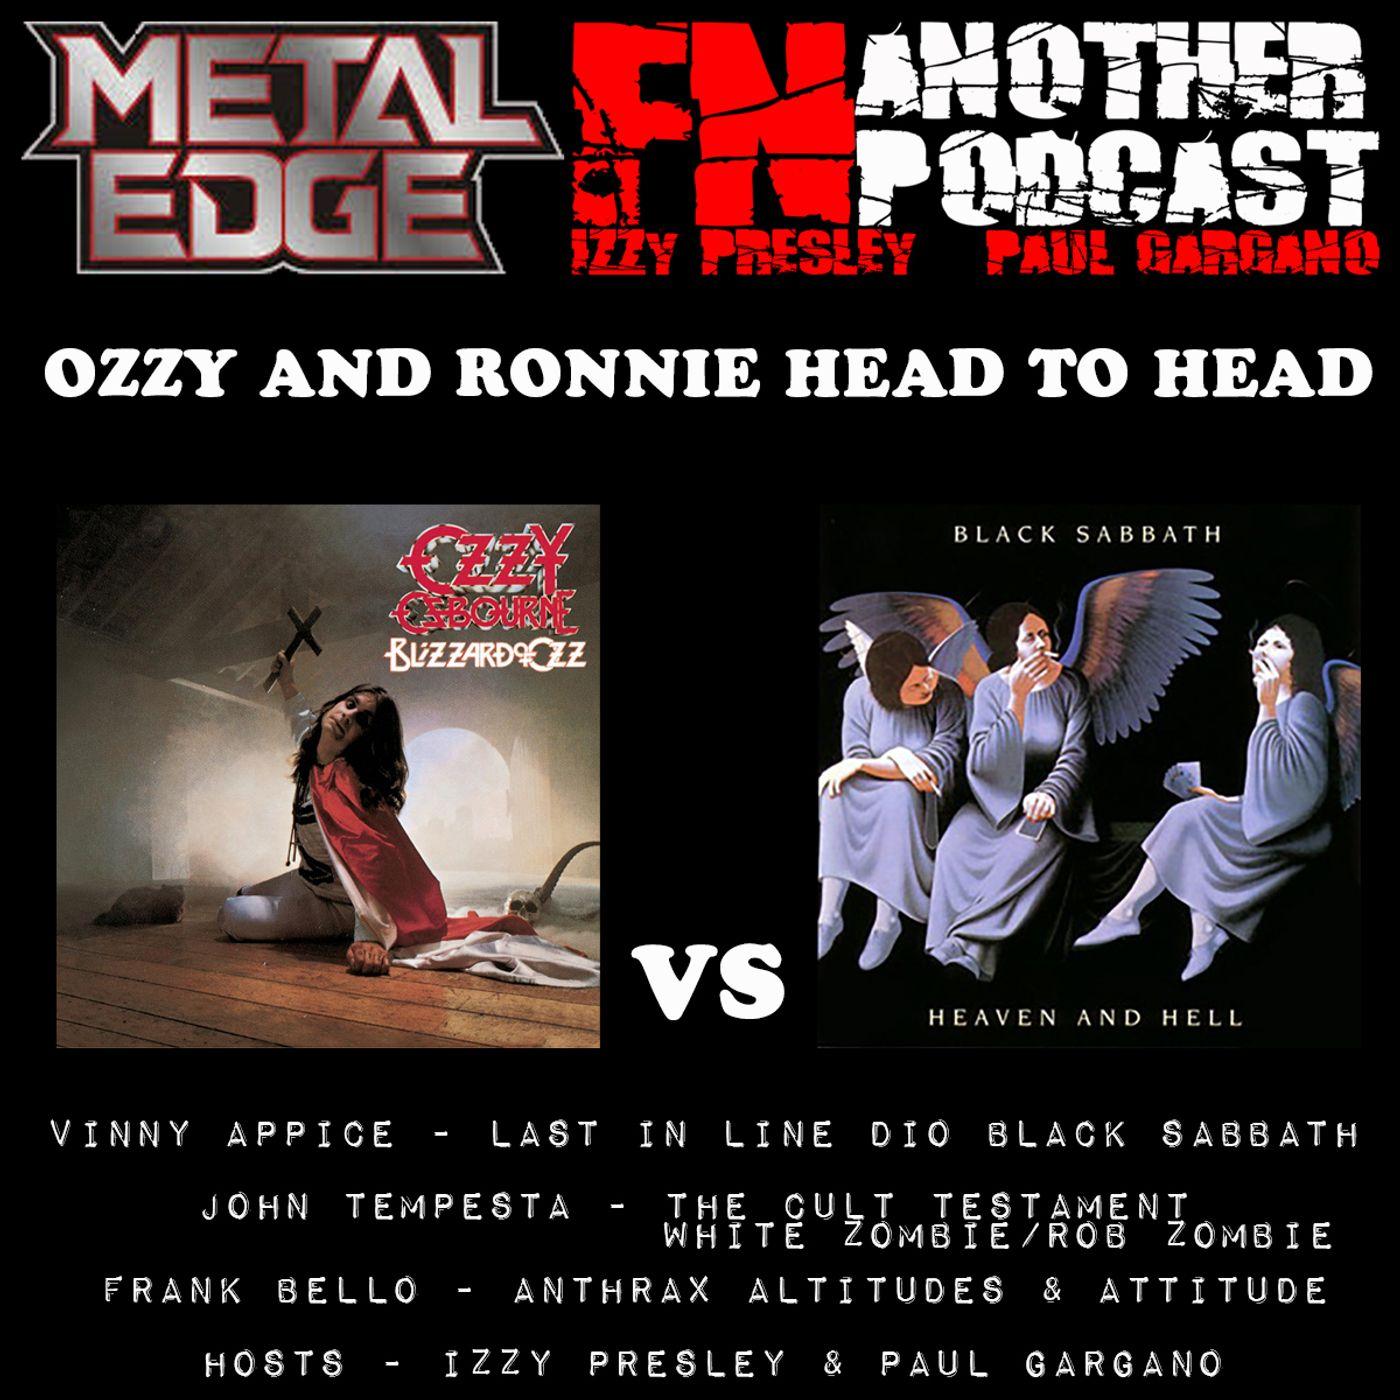 METAL EDGE PRESENTS - BLIZZARD OF OZZ VS HEAVEN AND HELL - VINNY APPICE FRANK BELLO JOHN TEMPESTA